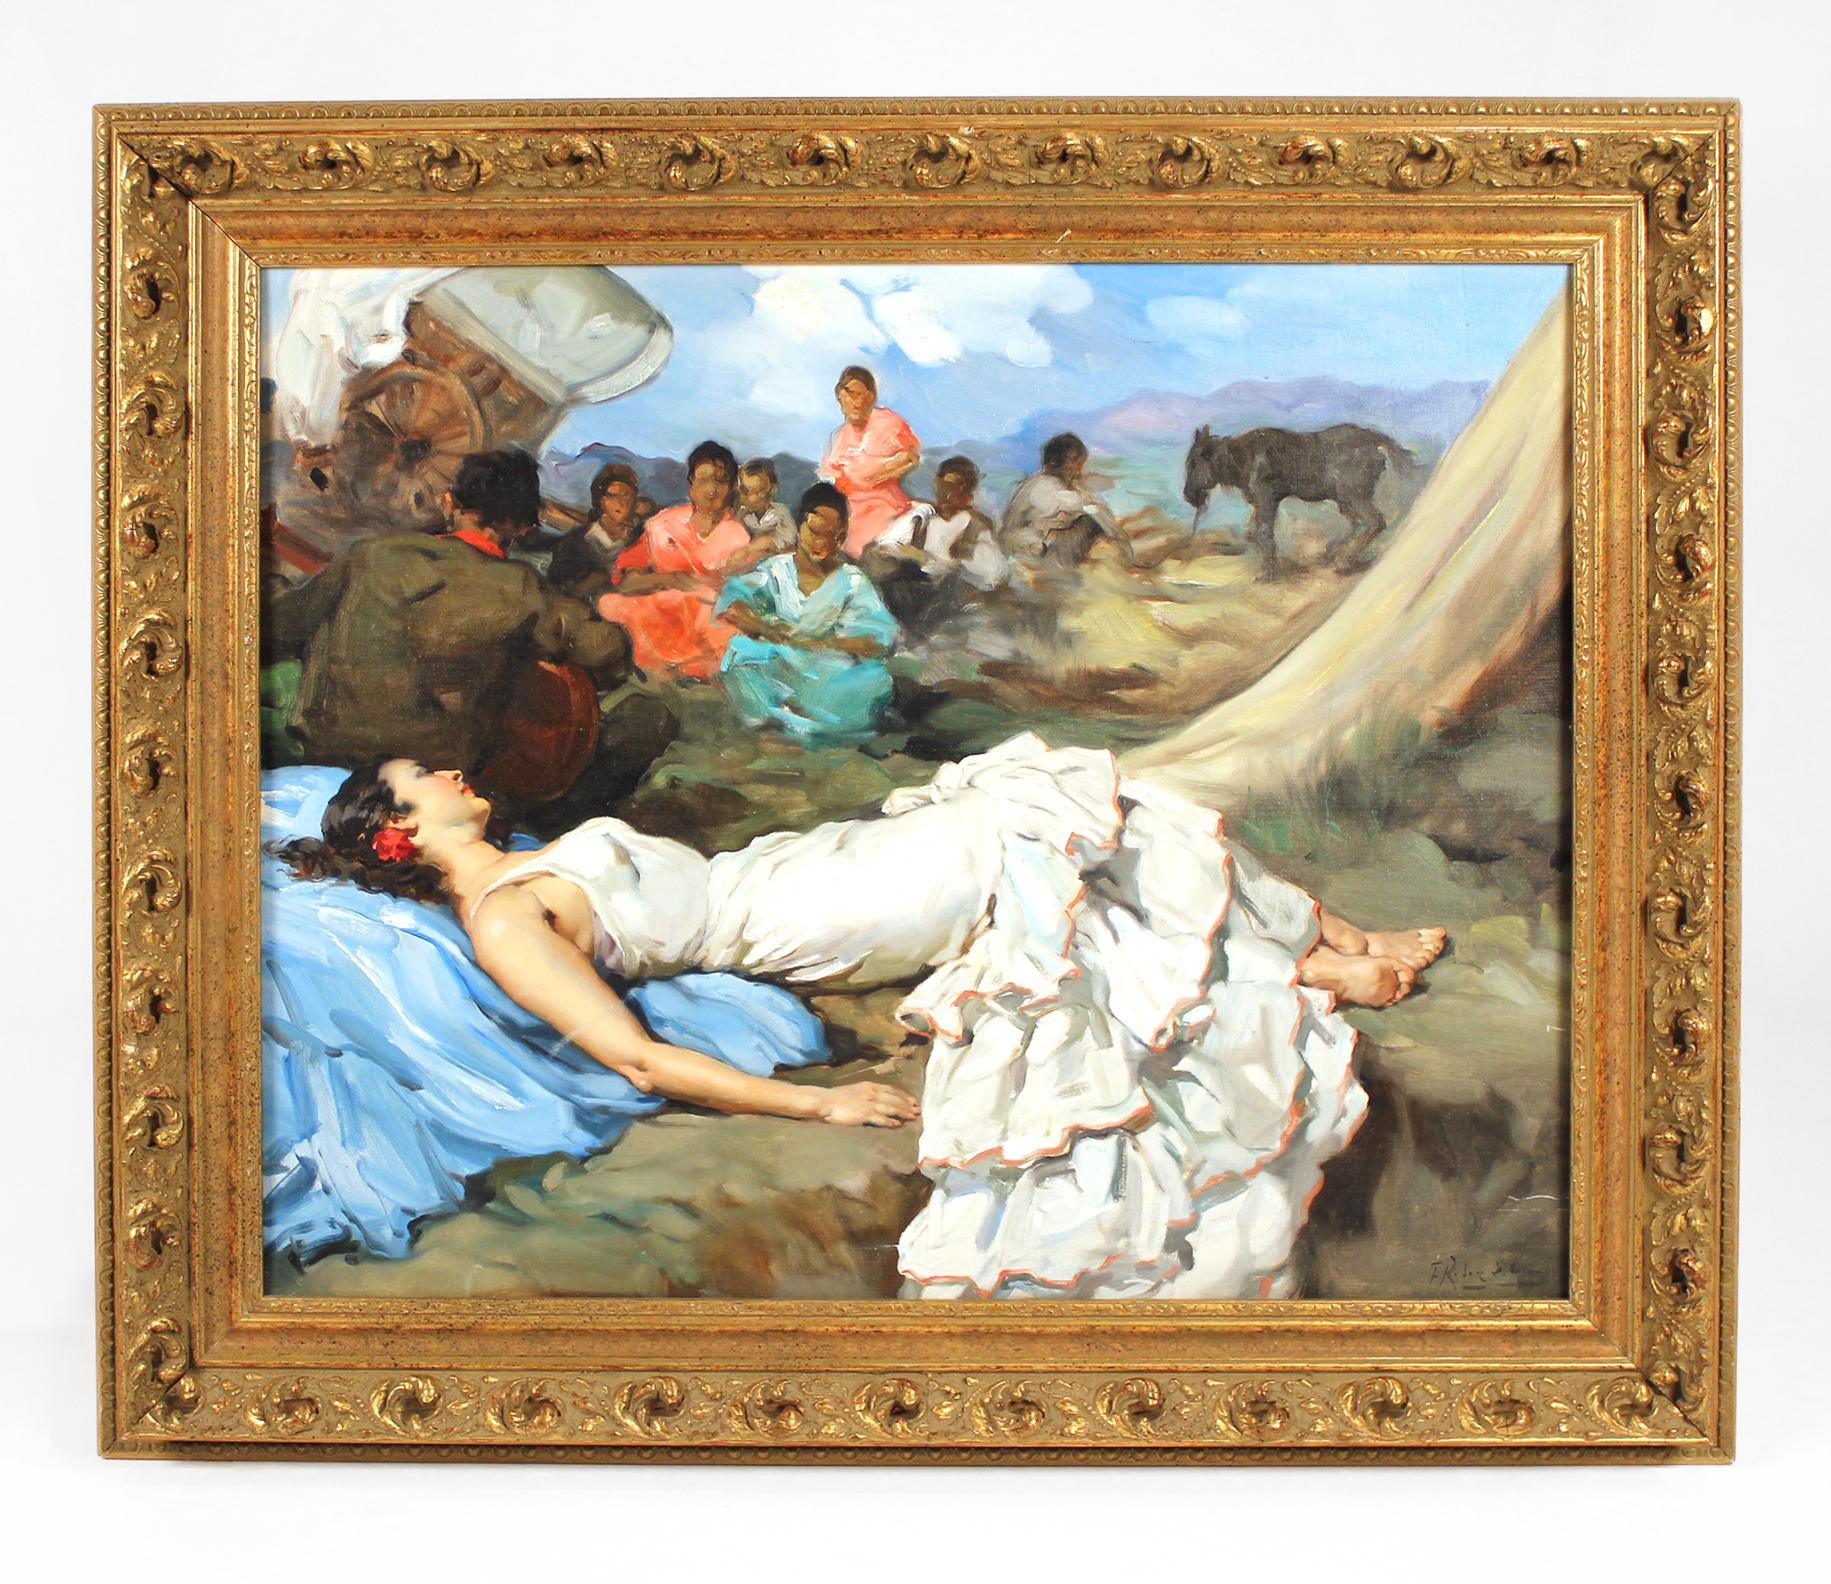 Francisco Rodriguez san Clemente Oil Painting